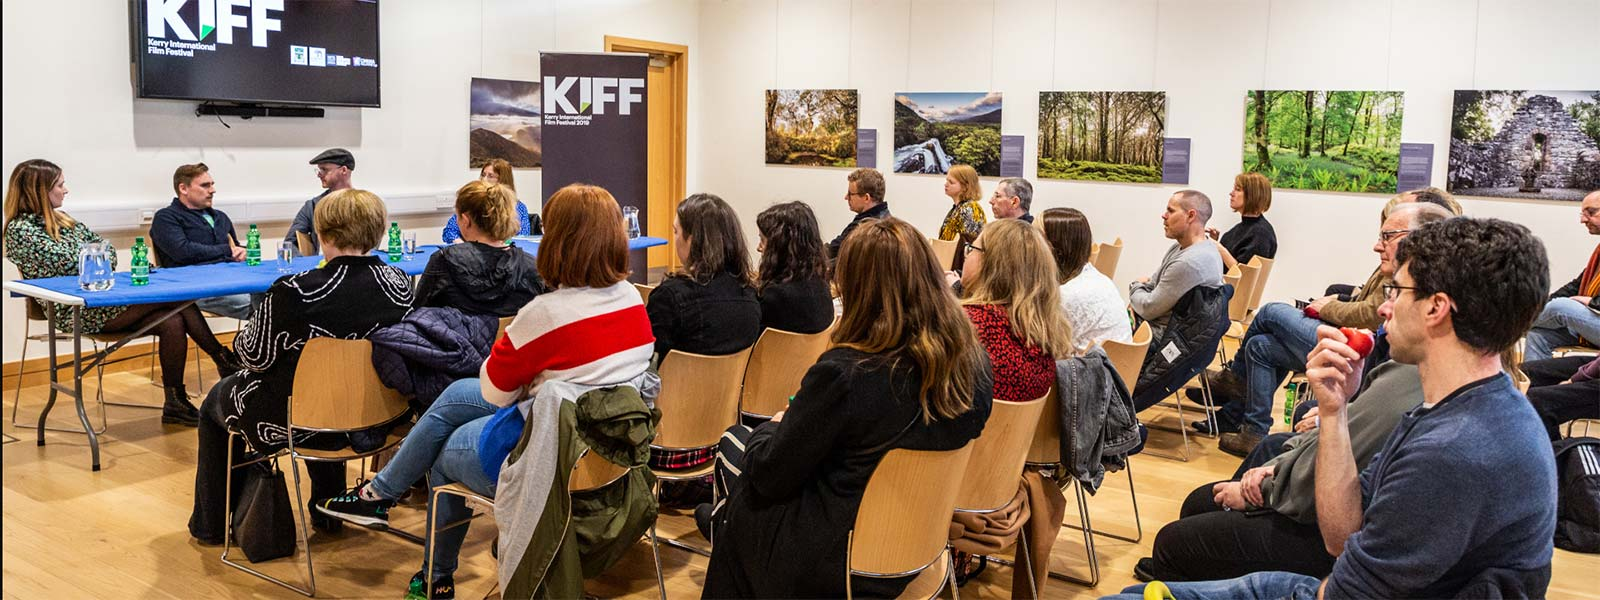 KIFF Industry Day